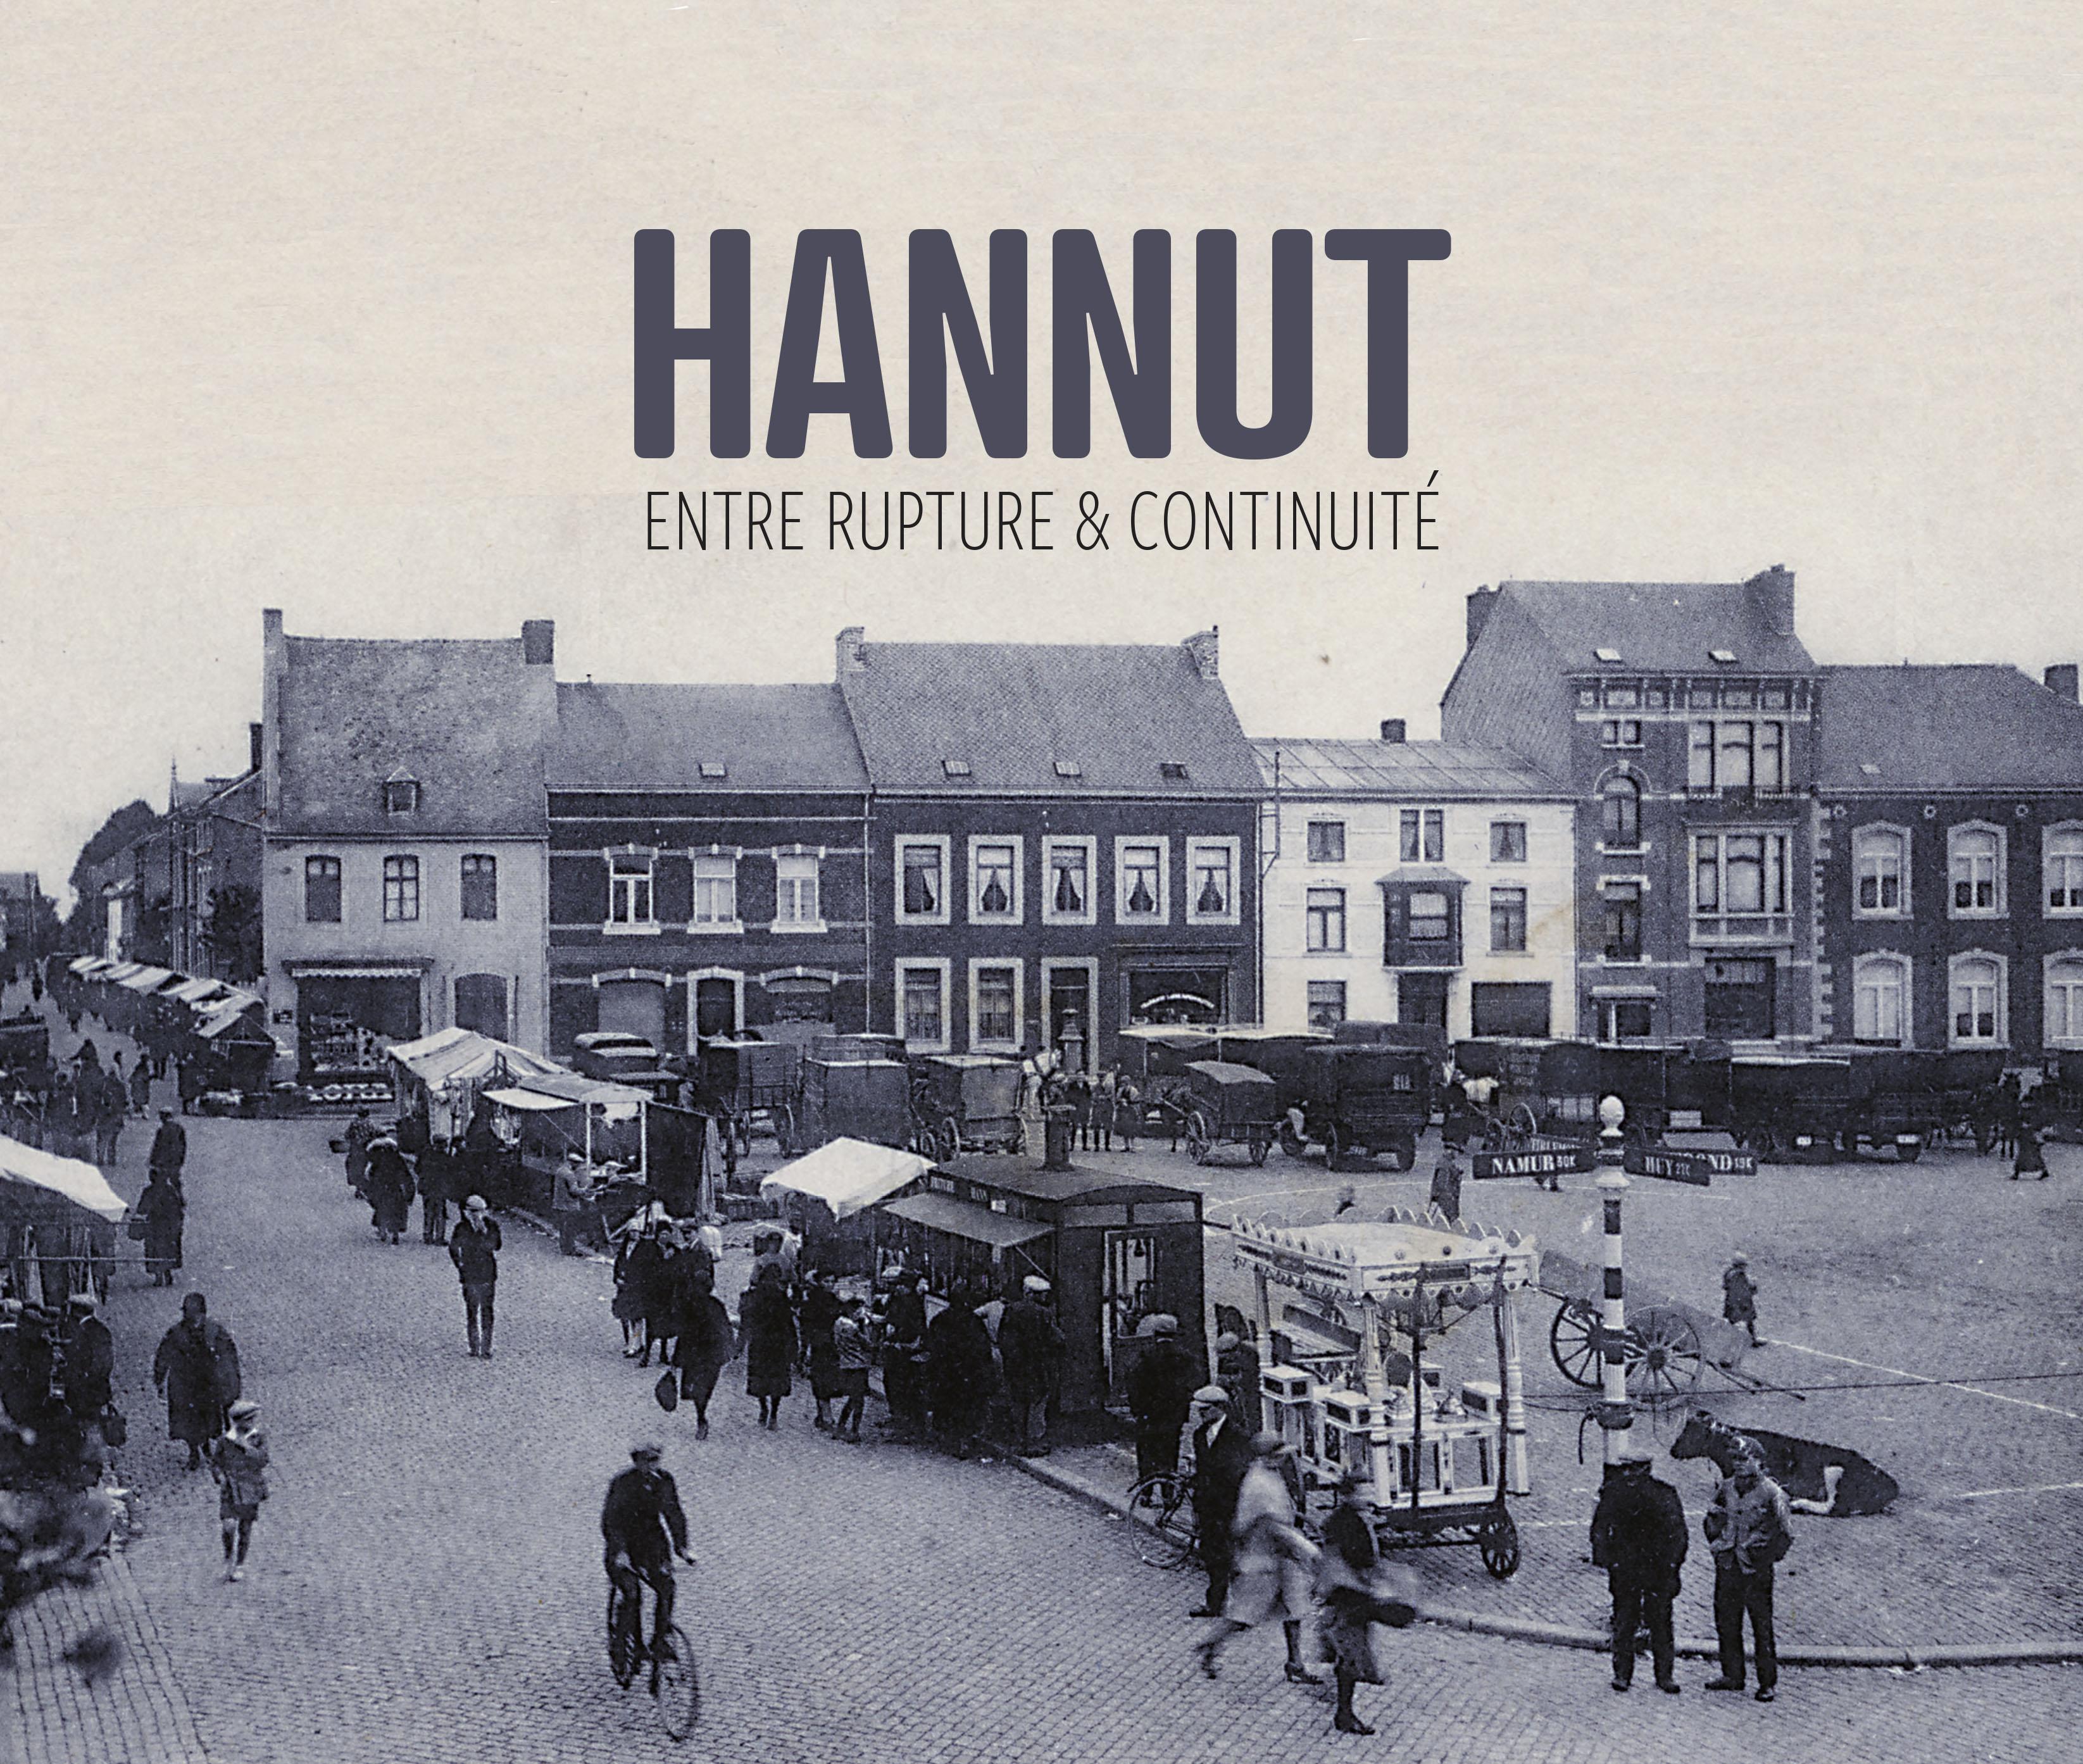 Hannut